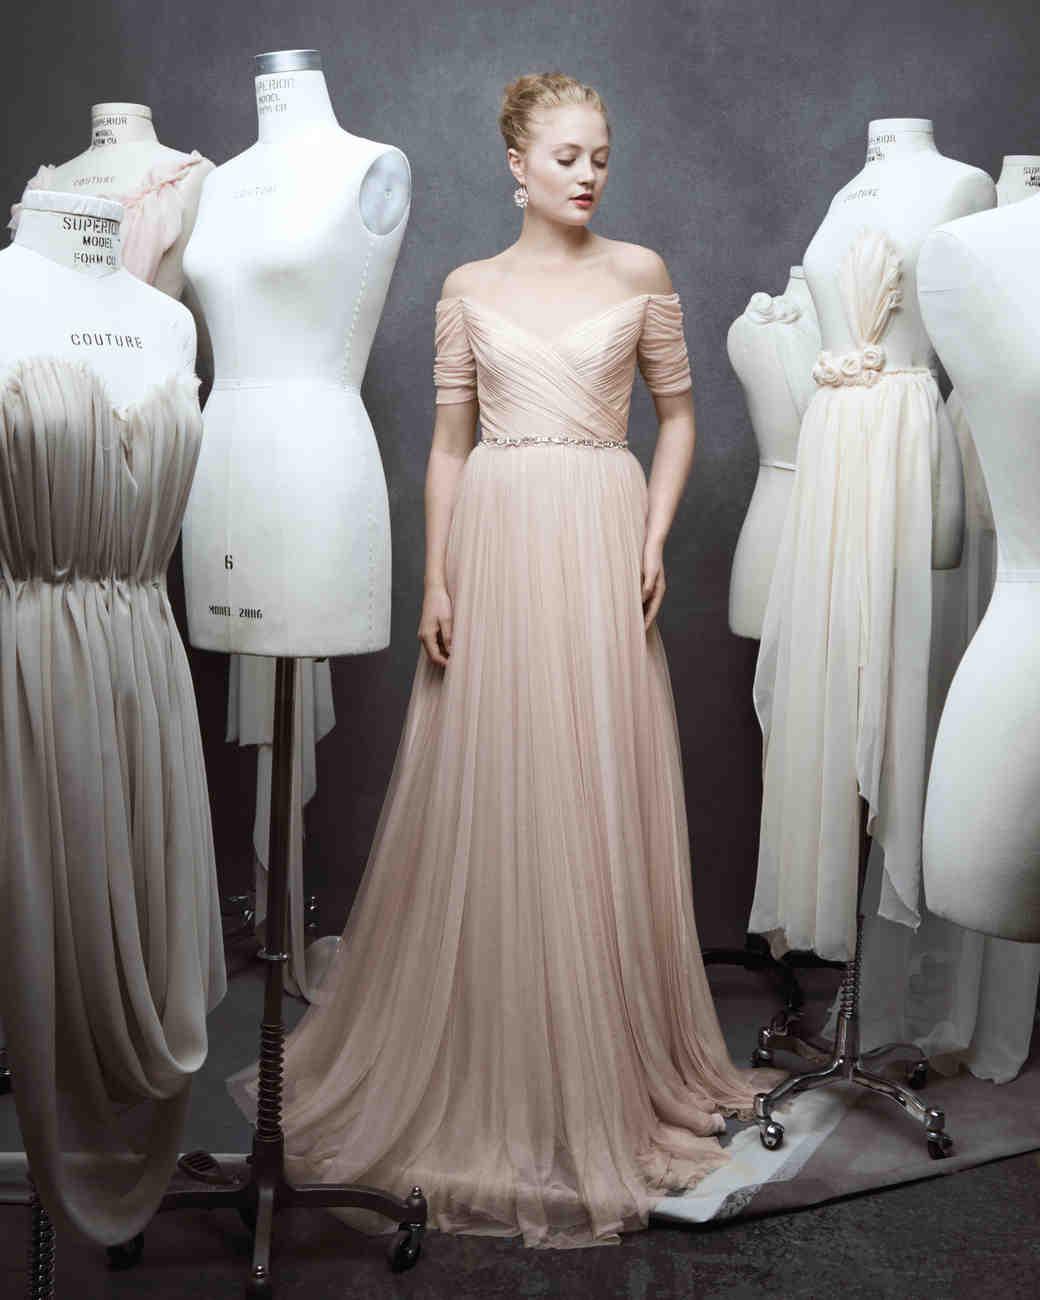 13 Amazing Wedding Dress Details